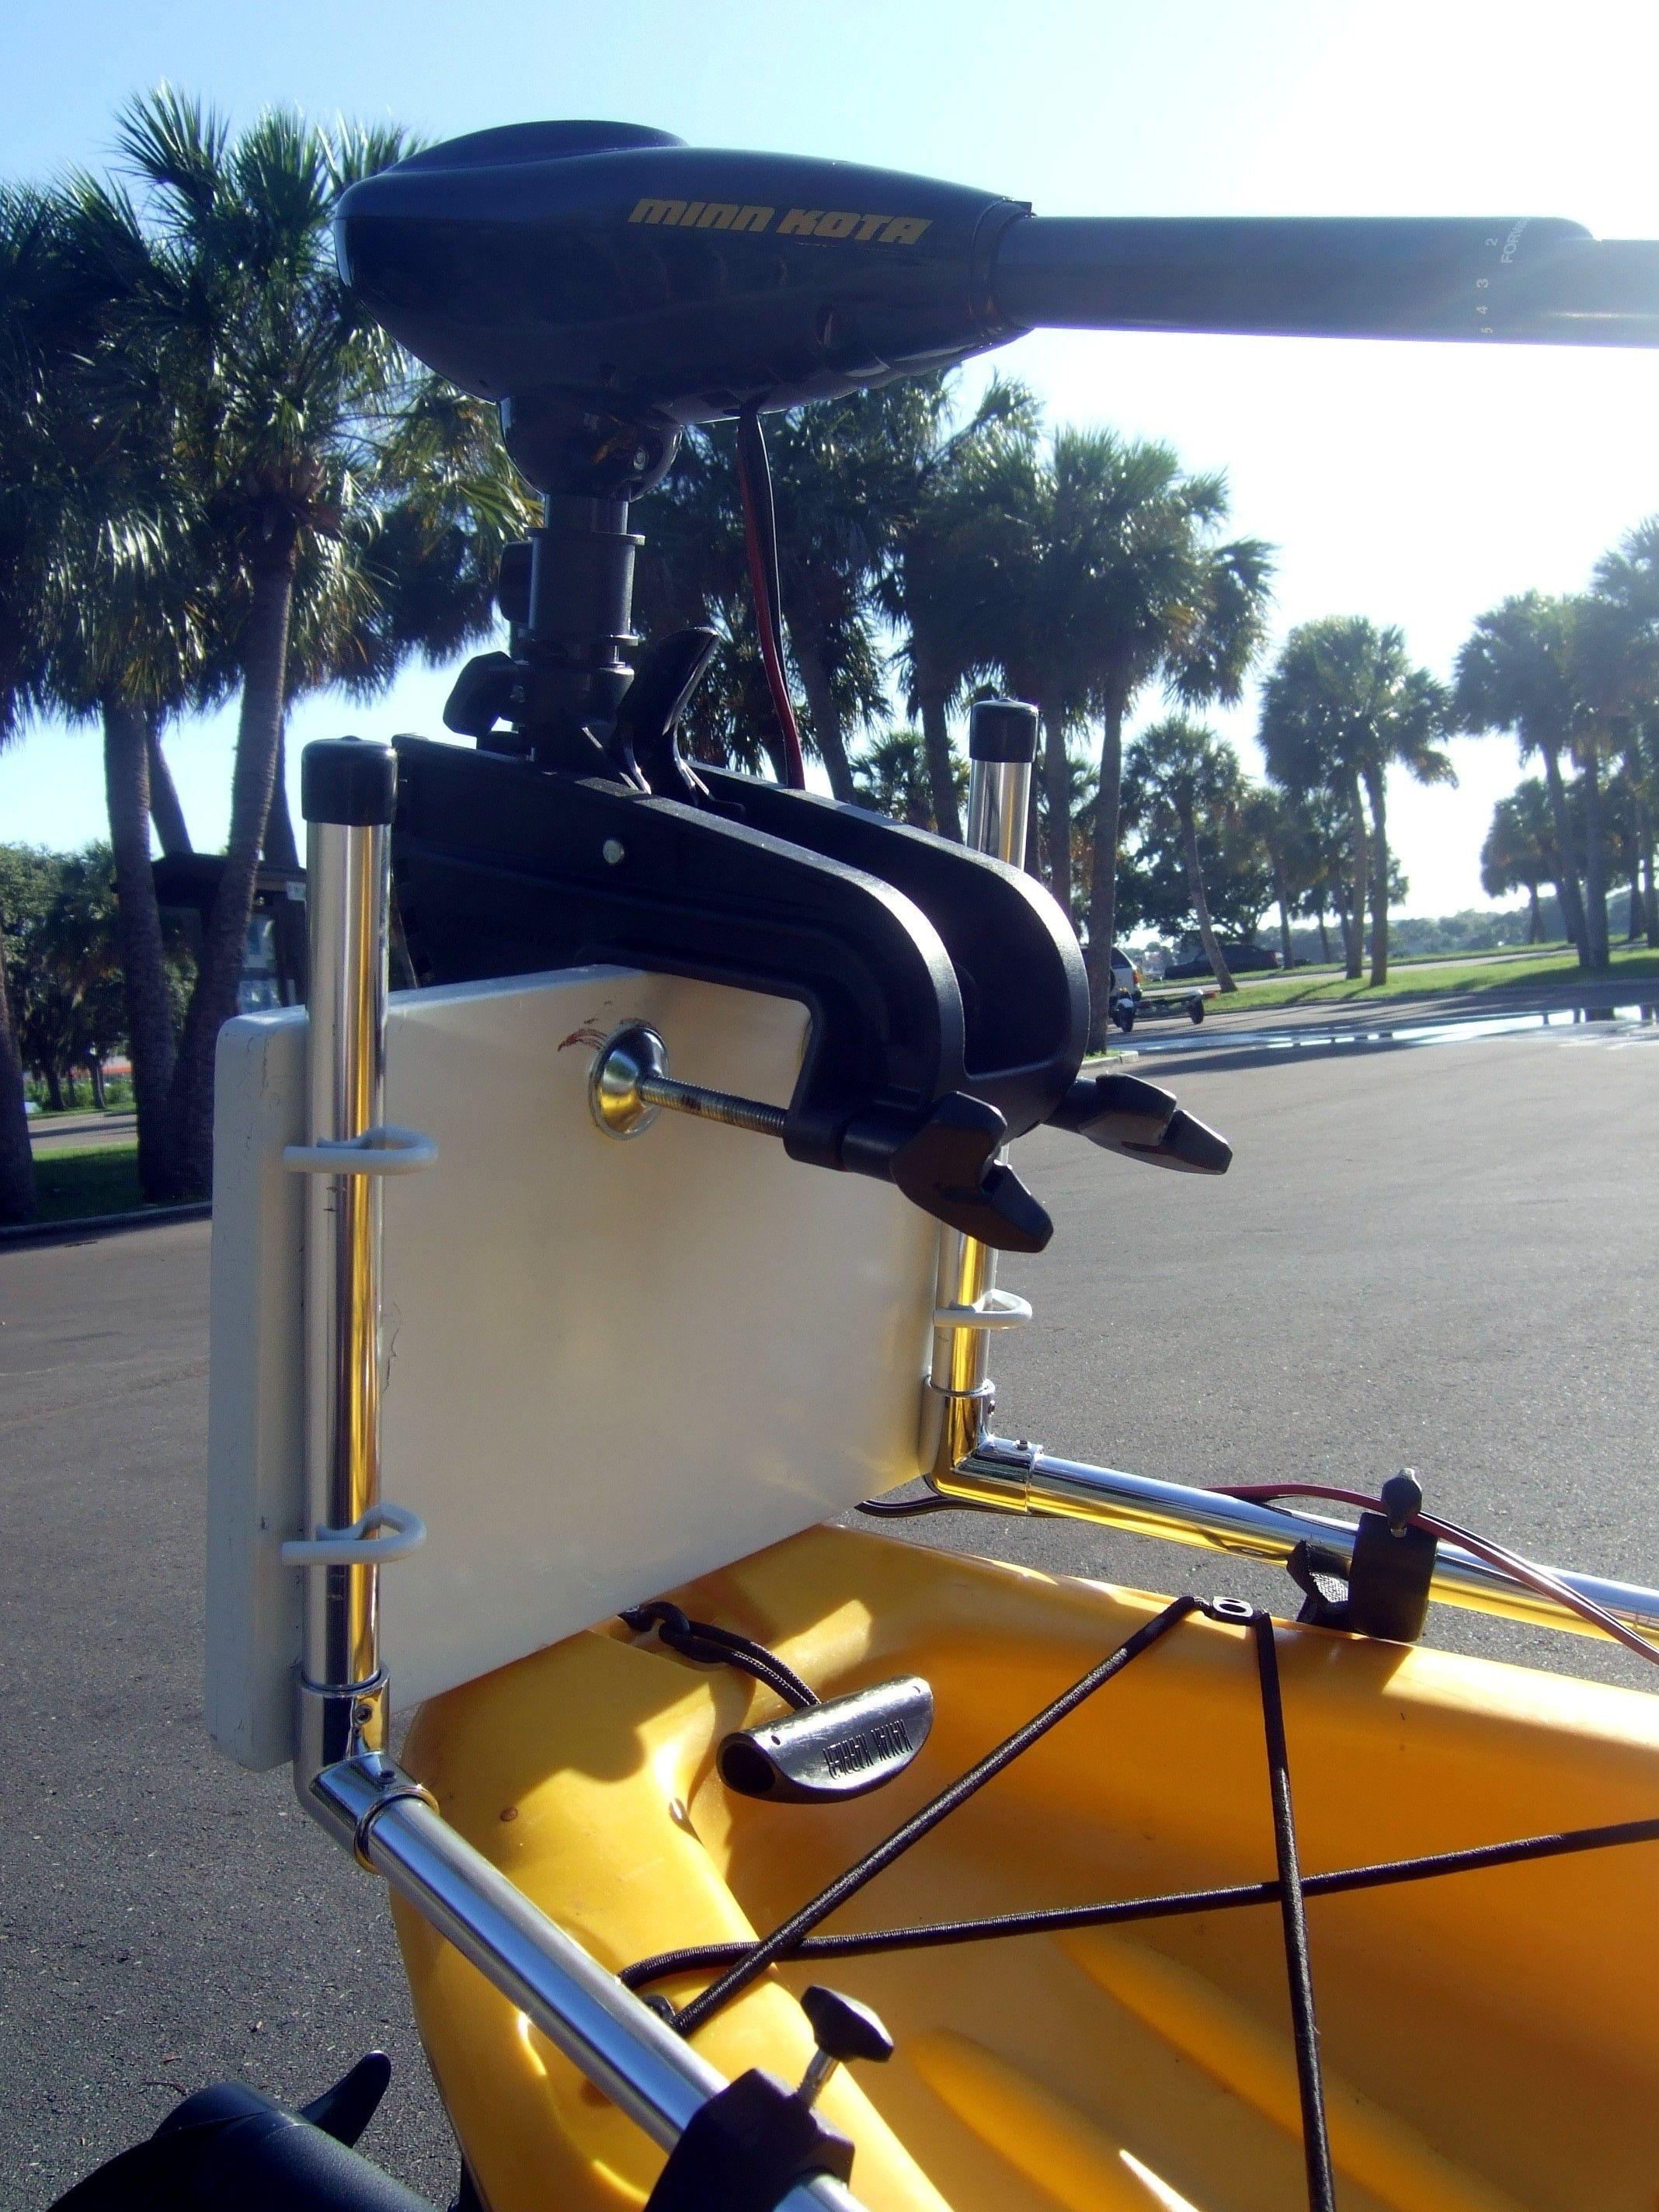 universal trolling motor bracket for your kayak or canoe